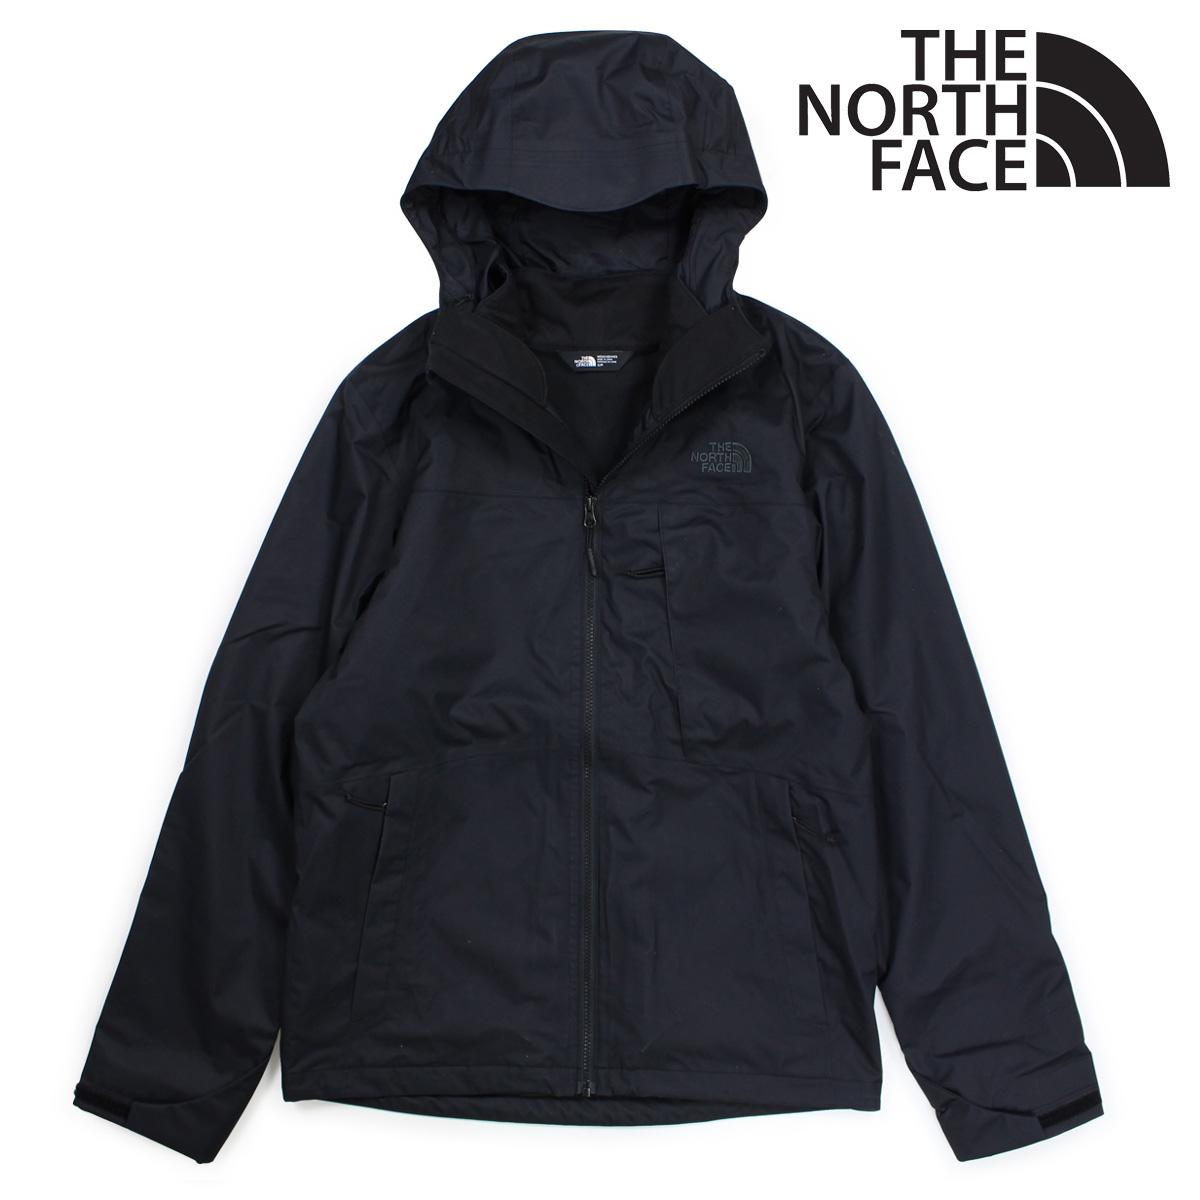 2dbd6e7cd THE NORTH FACE North Face jacket mountain parka men MENS ARROWOOD  TRICLIMATE JACKET black black NF0A2TCN